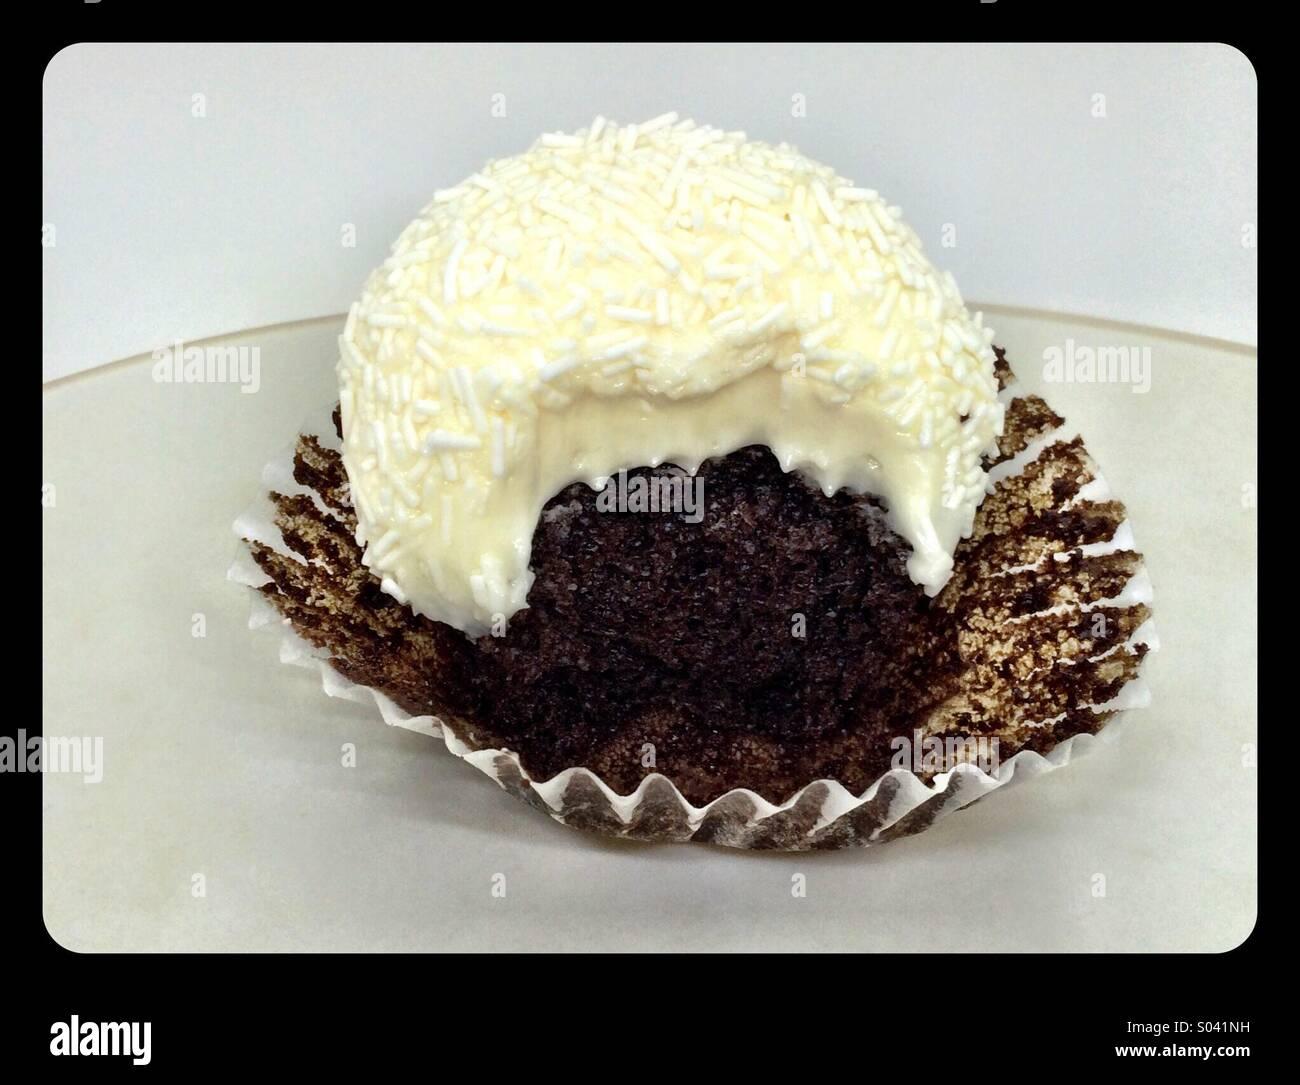 Tuxedo cupcake - Stock Image